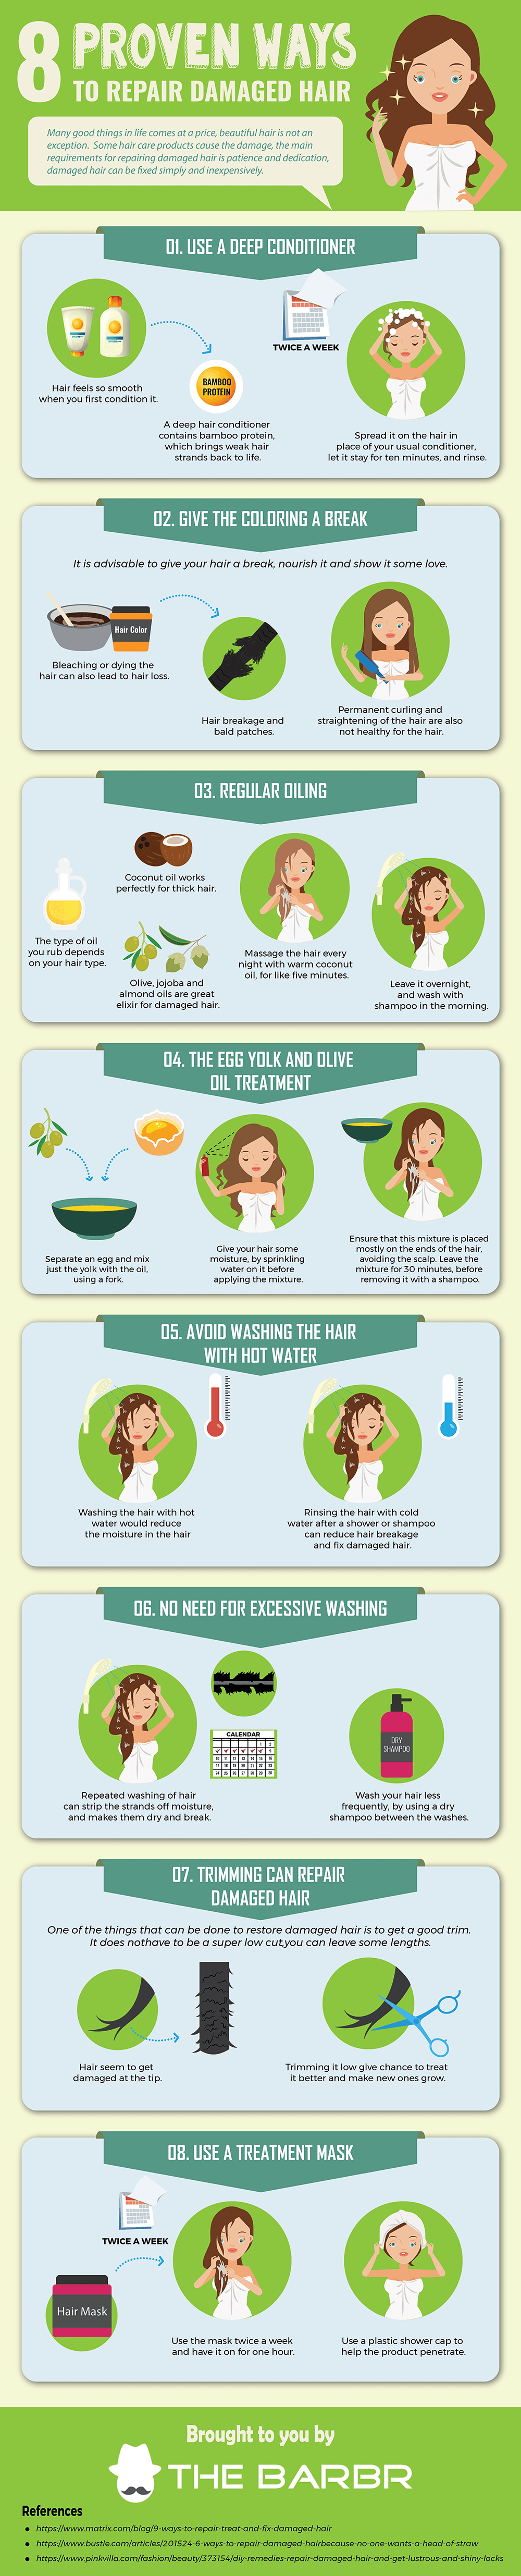 8 Proven Ways to Repair Damaged Hair